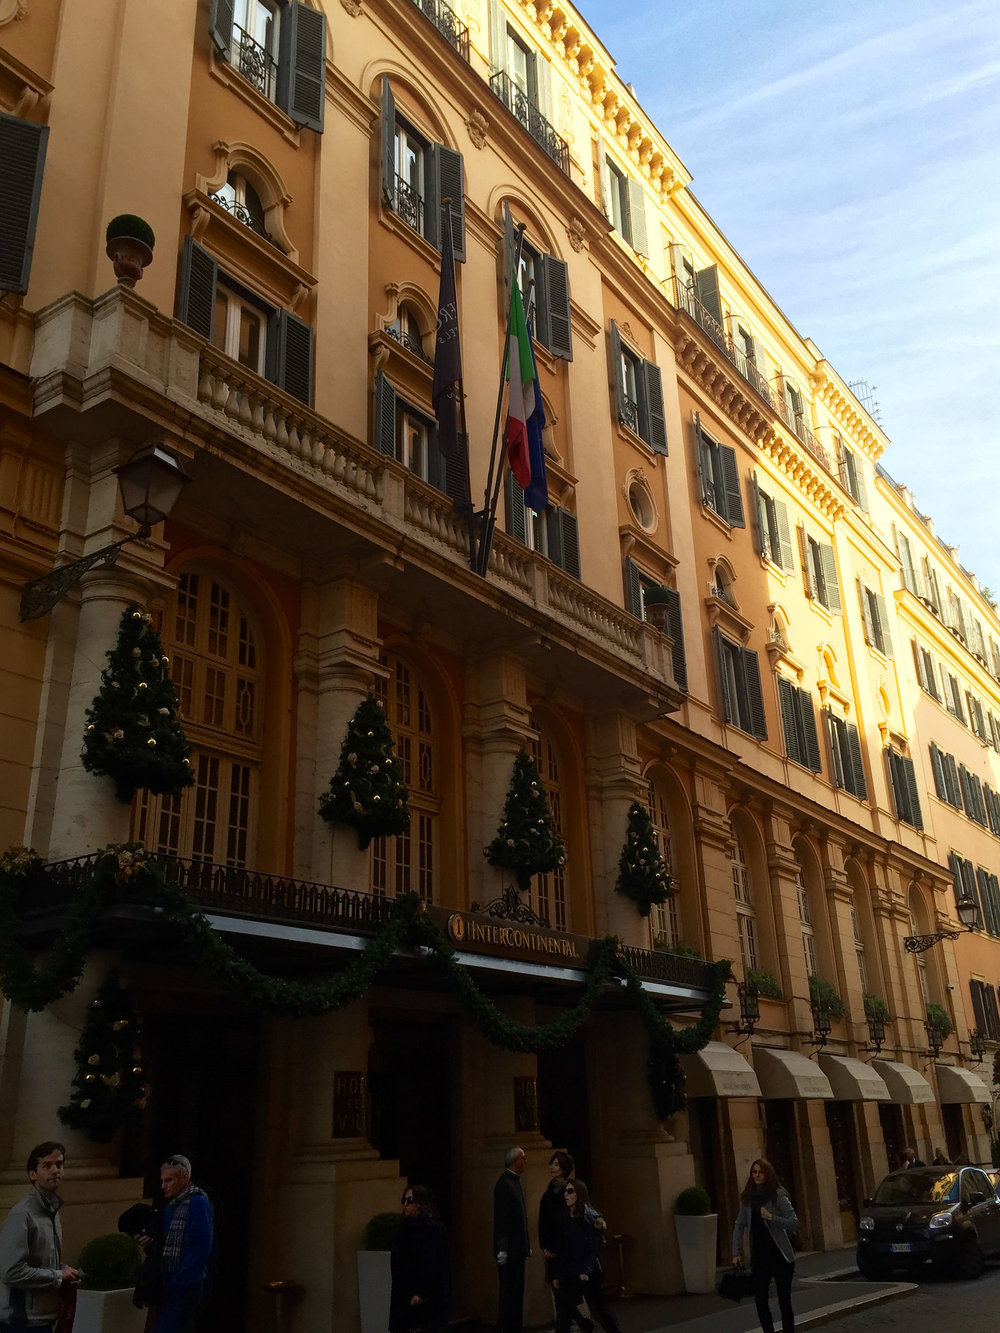 Hotel de la ville.jpg